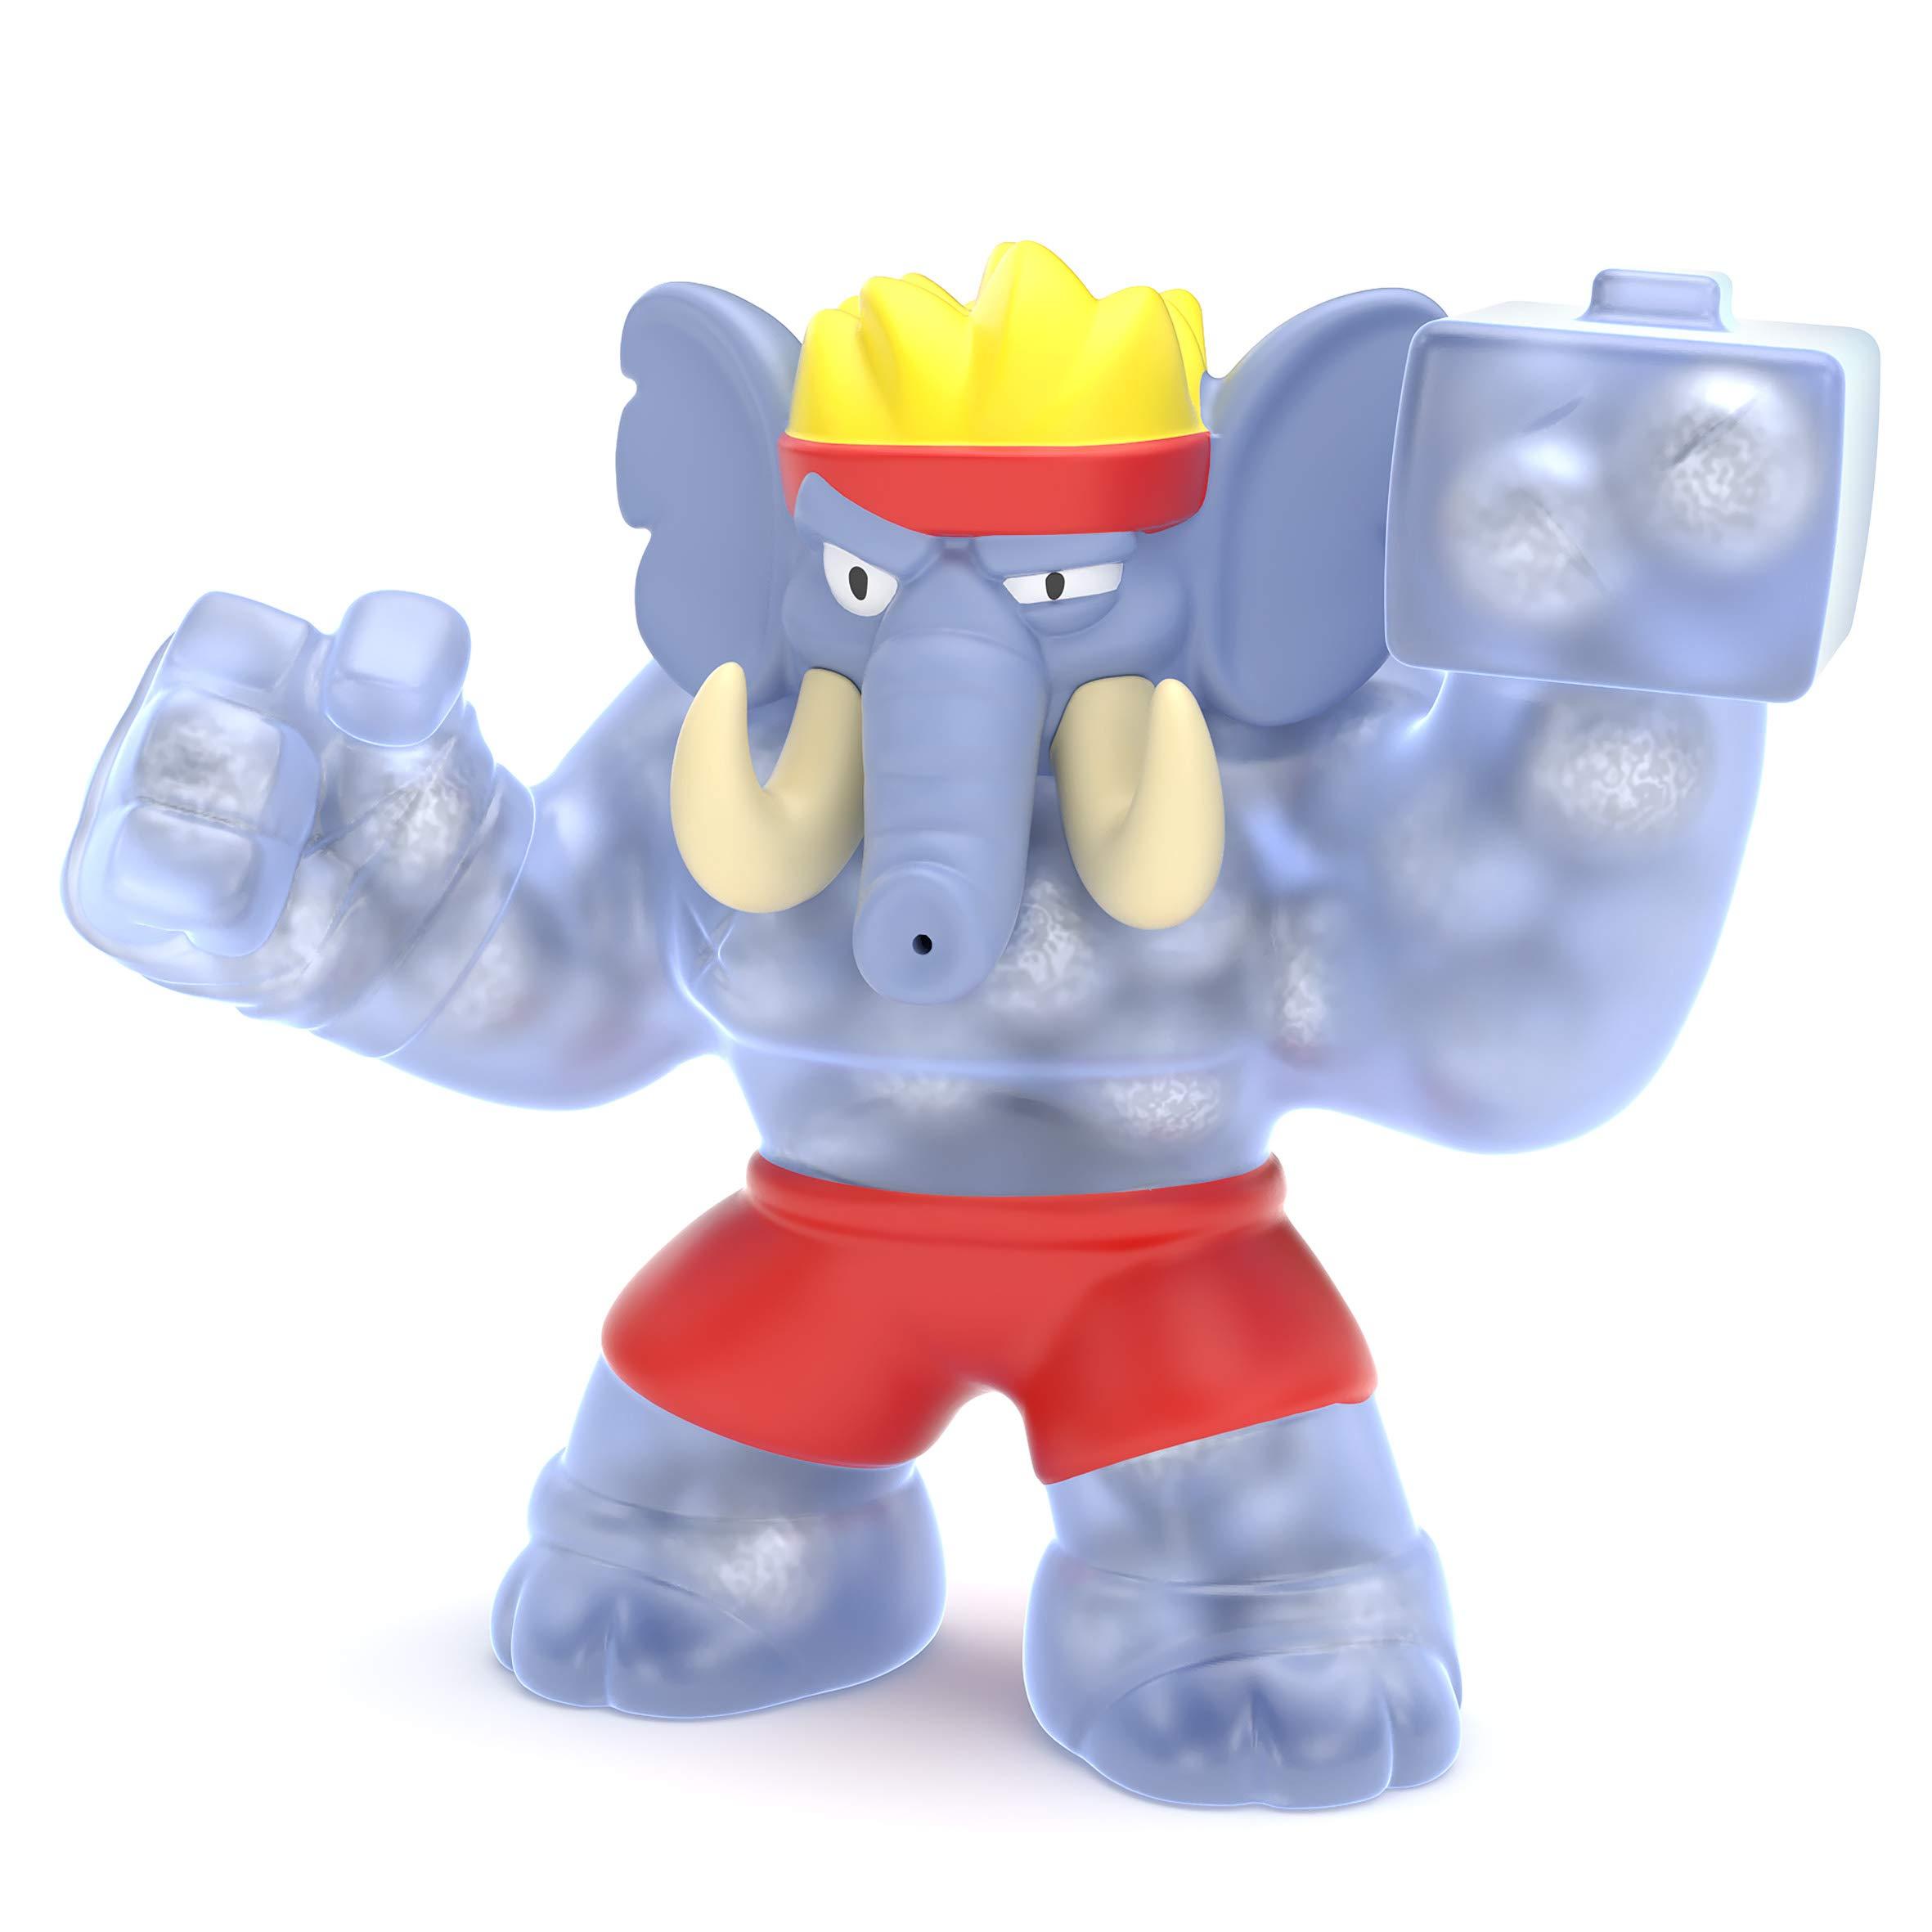 Heroes of Goo Jit Zu 41044 Hero Pack S2 GIGATUSK The Elephant, Multicolor